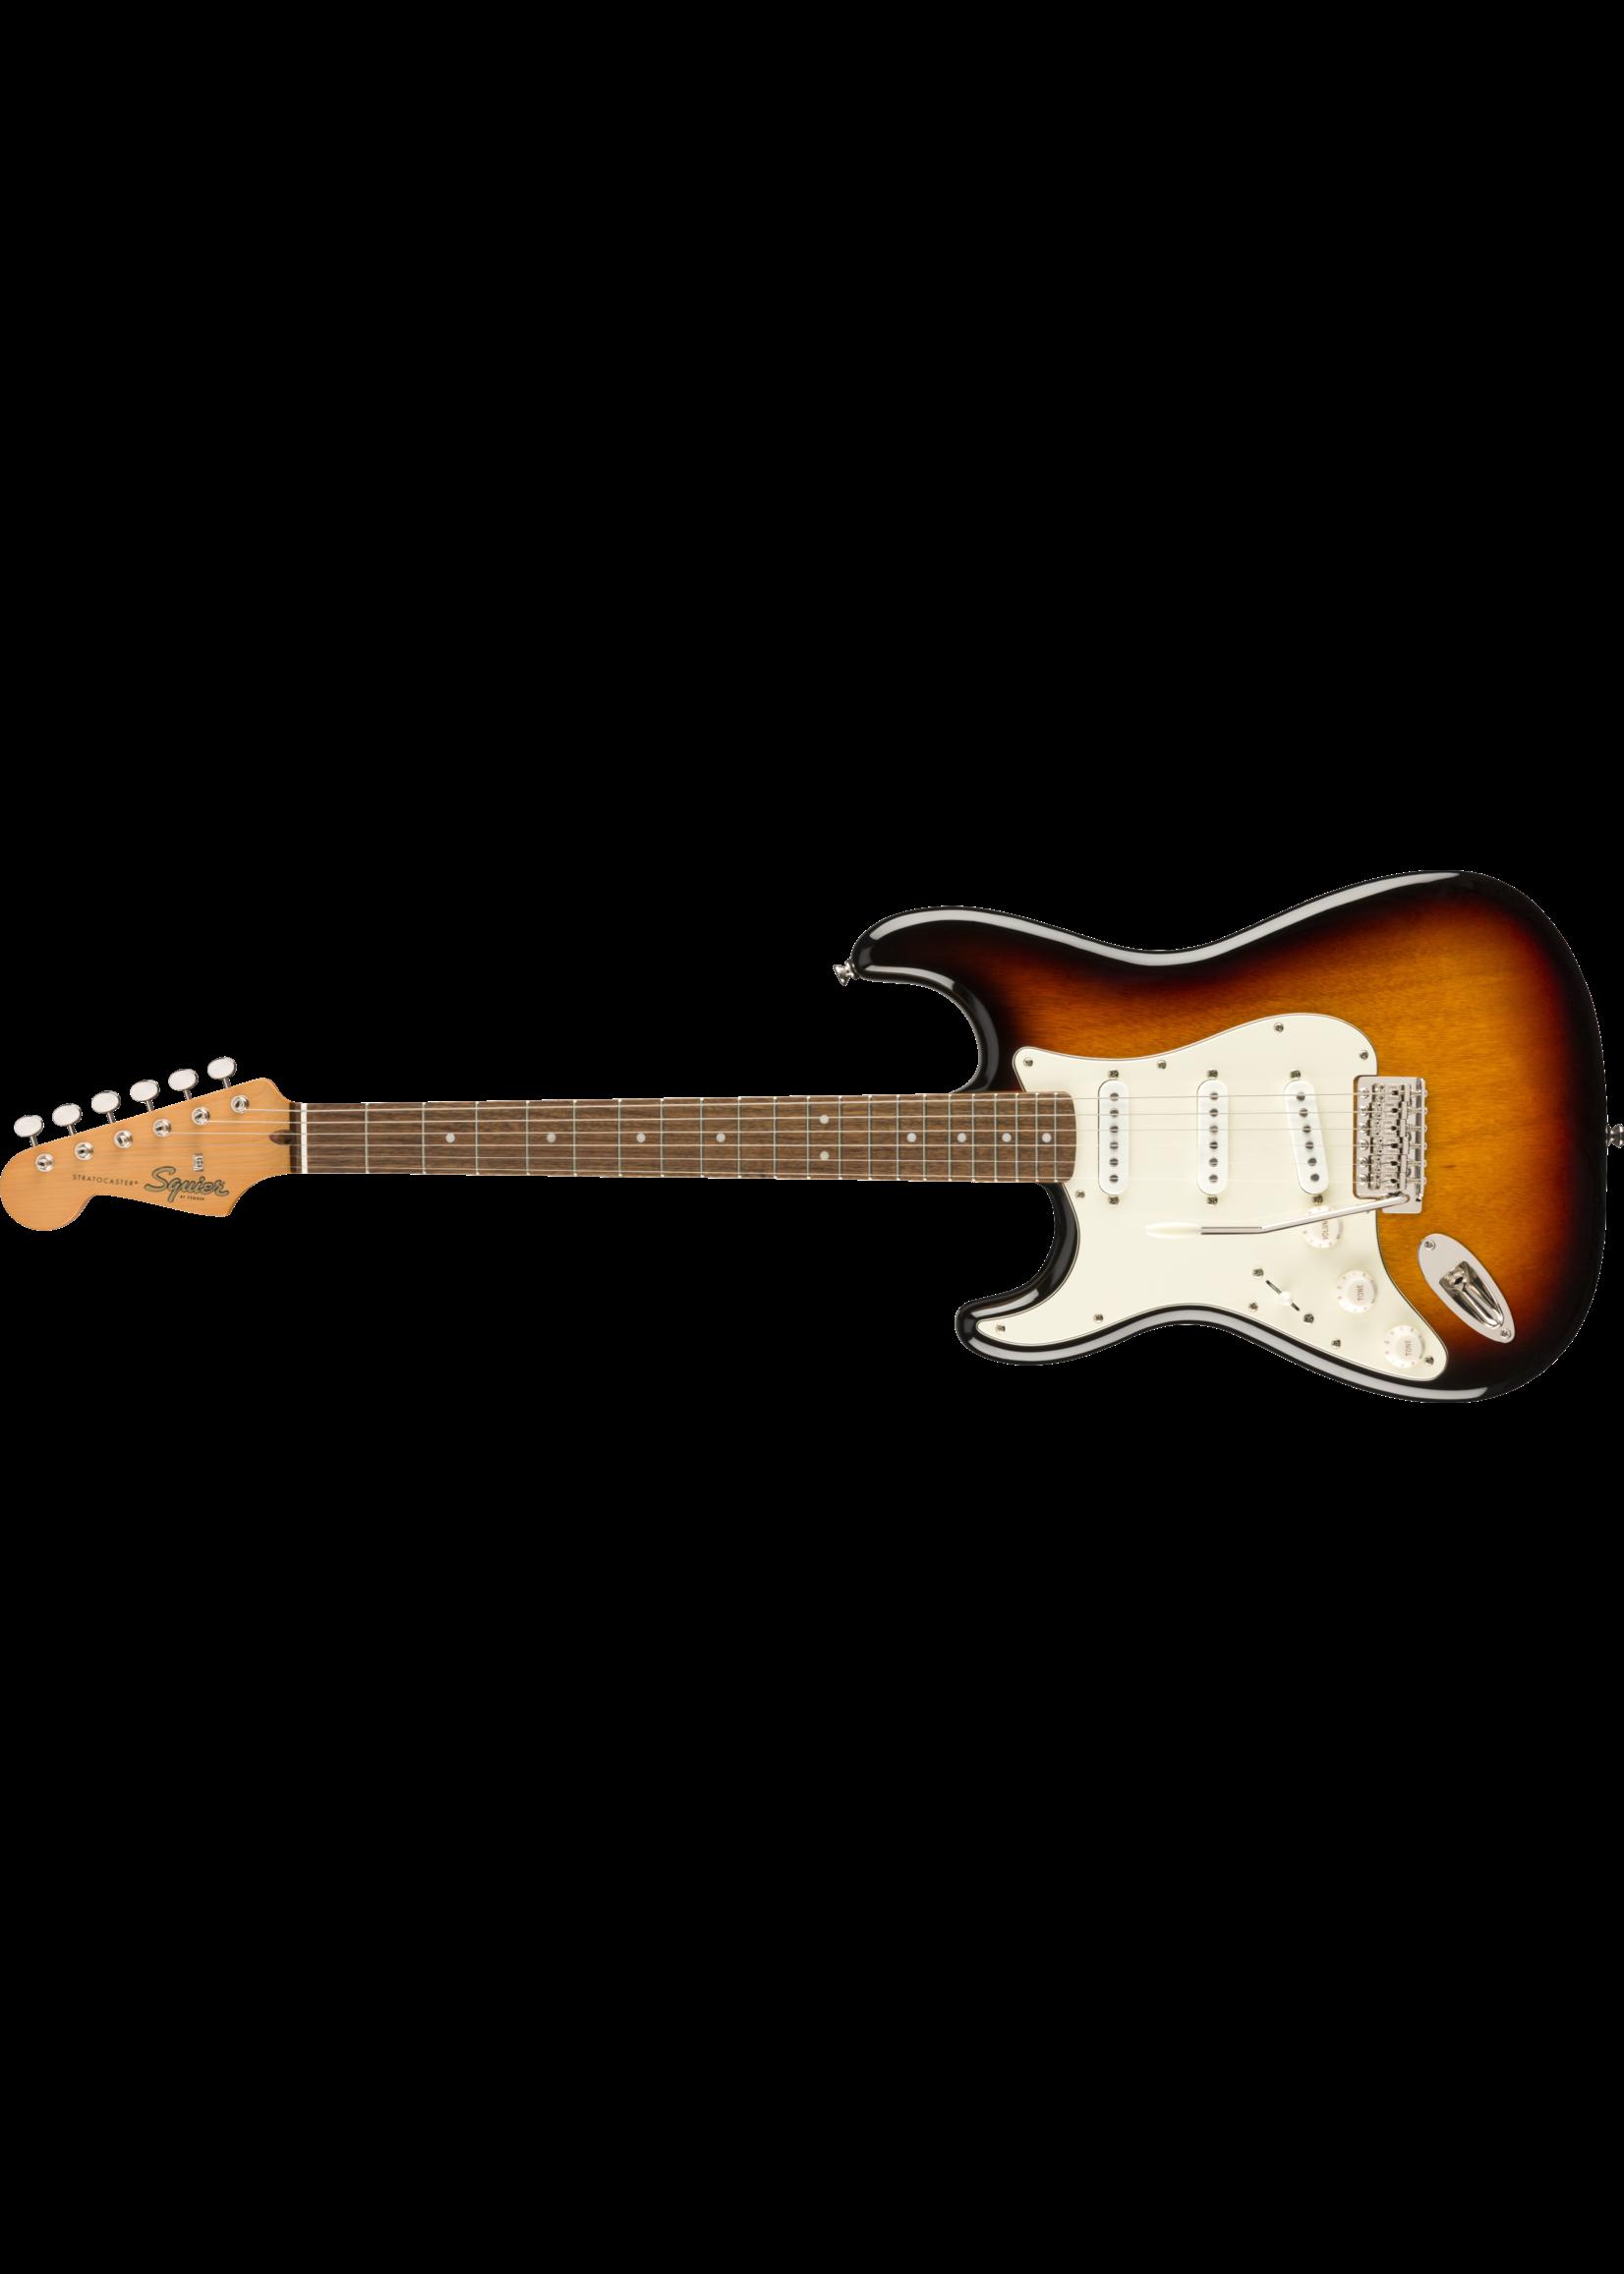 Squier Squier Classic Vibe '60s Stratocaster LH Left-Handed LRL Laurel Fingerboard Sunburst